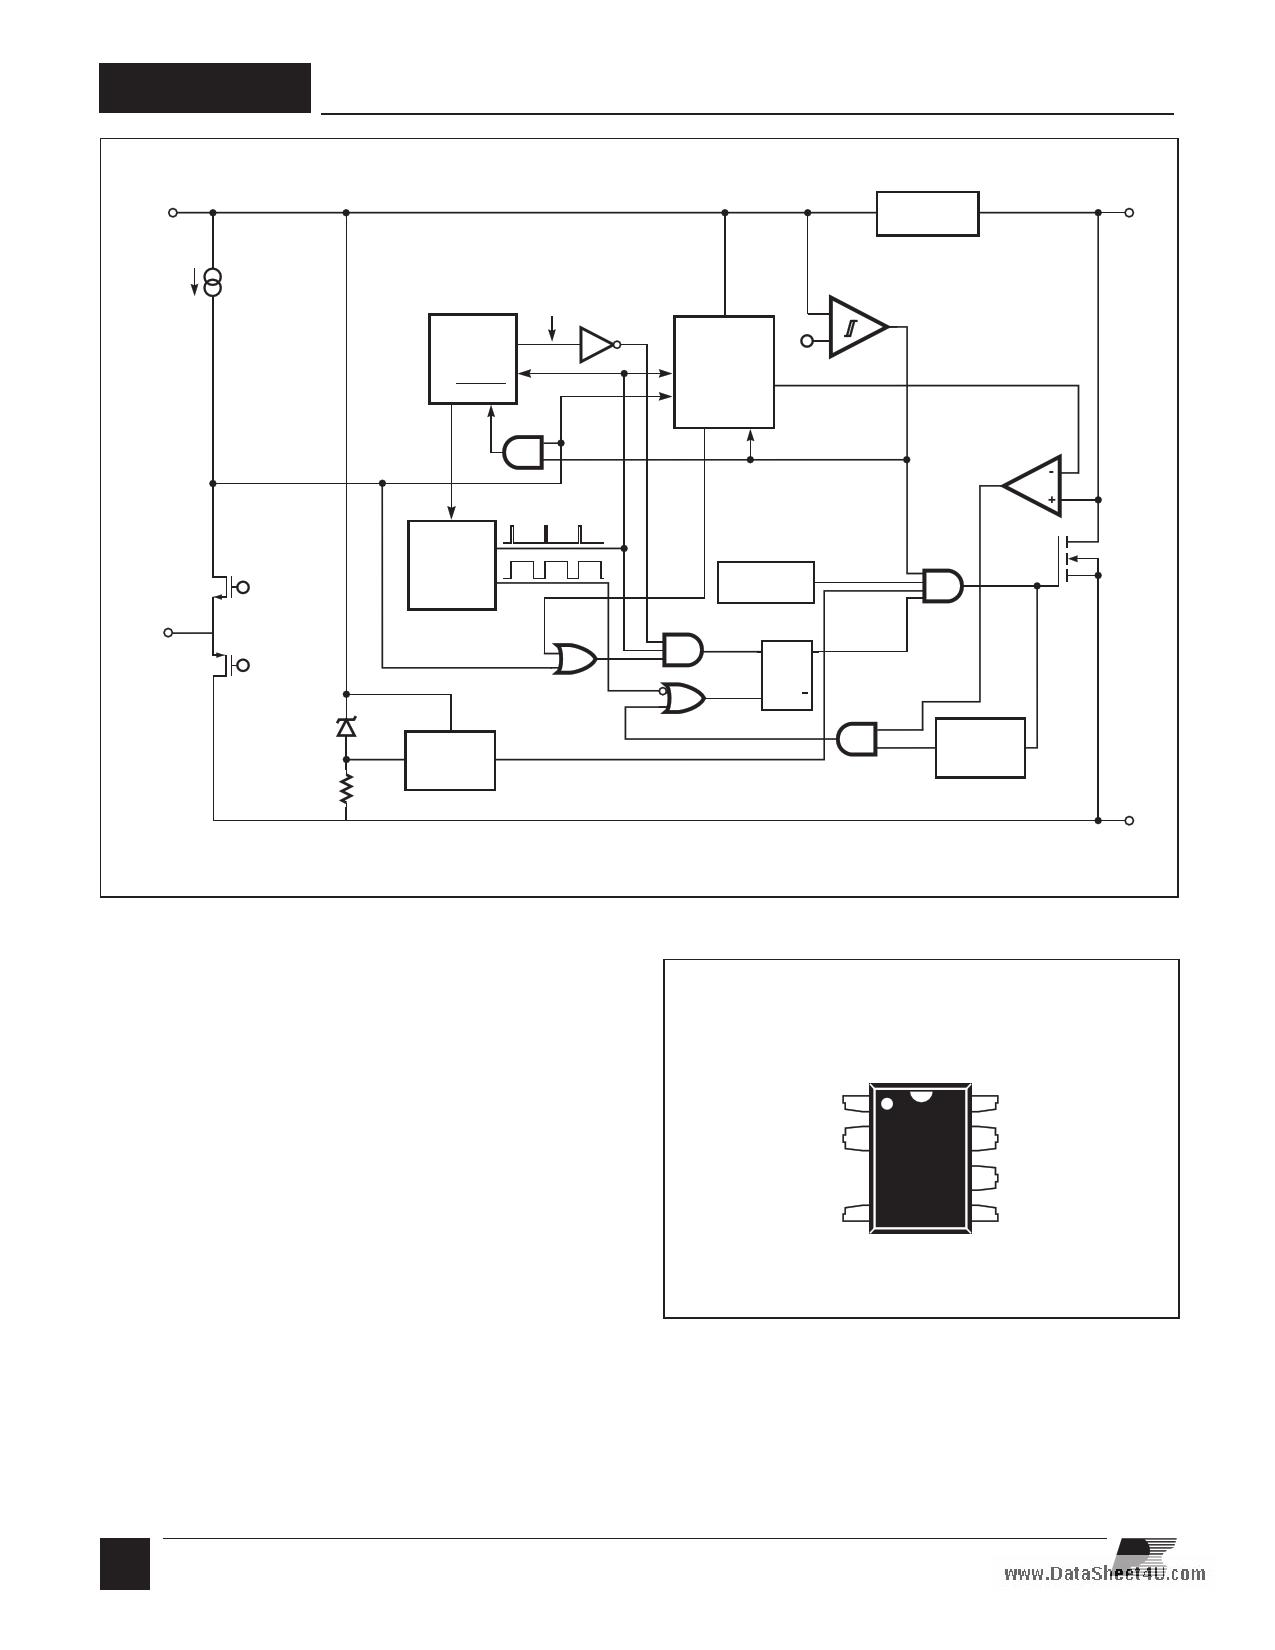 TNY175PN pdf schematic